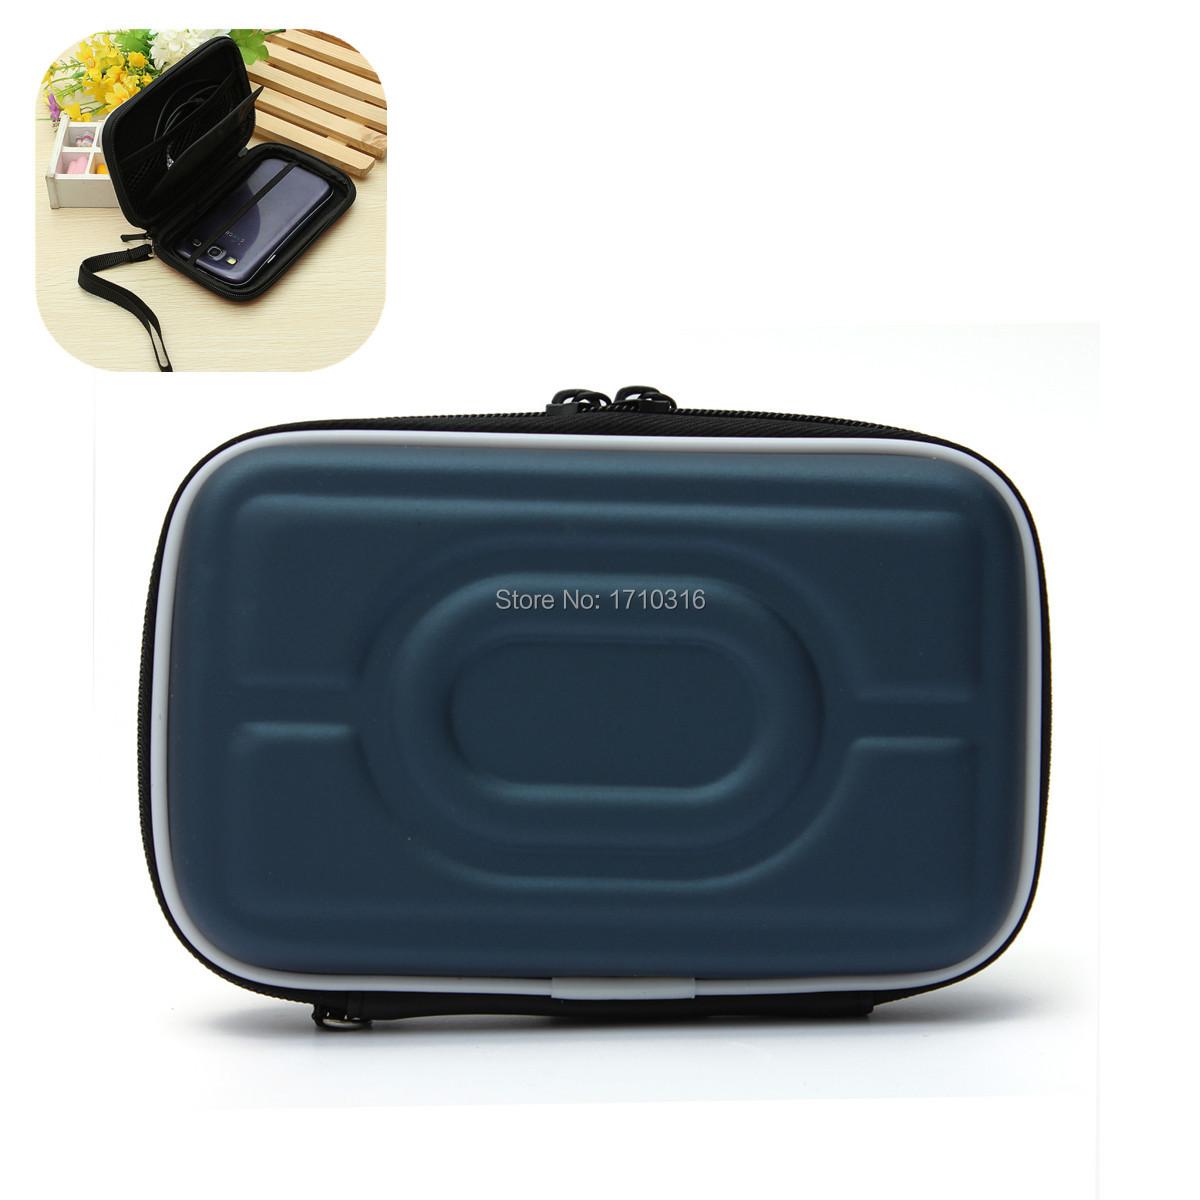 Hot Shockproof Waterproof Shockproof HDD Case Bag Cover Protector Black For 2 5 Inch Hard Disk